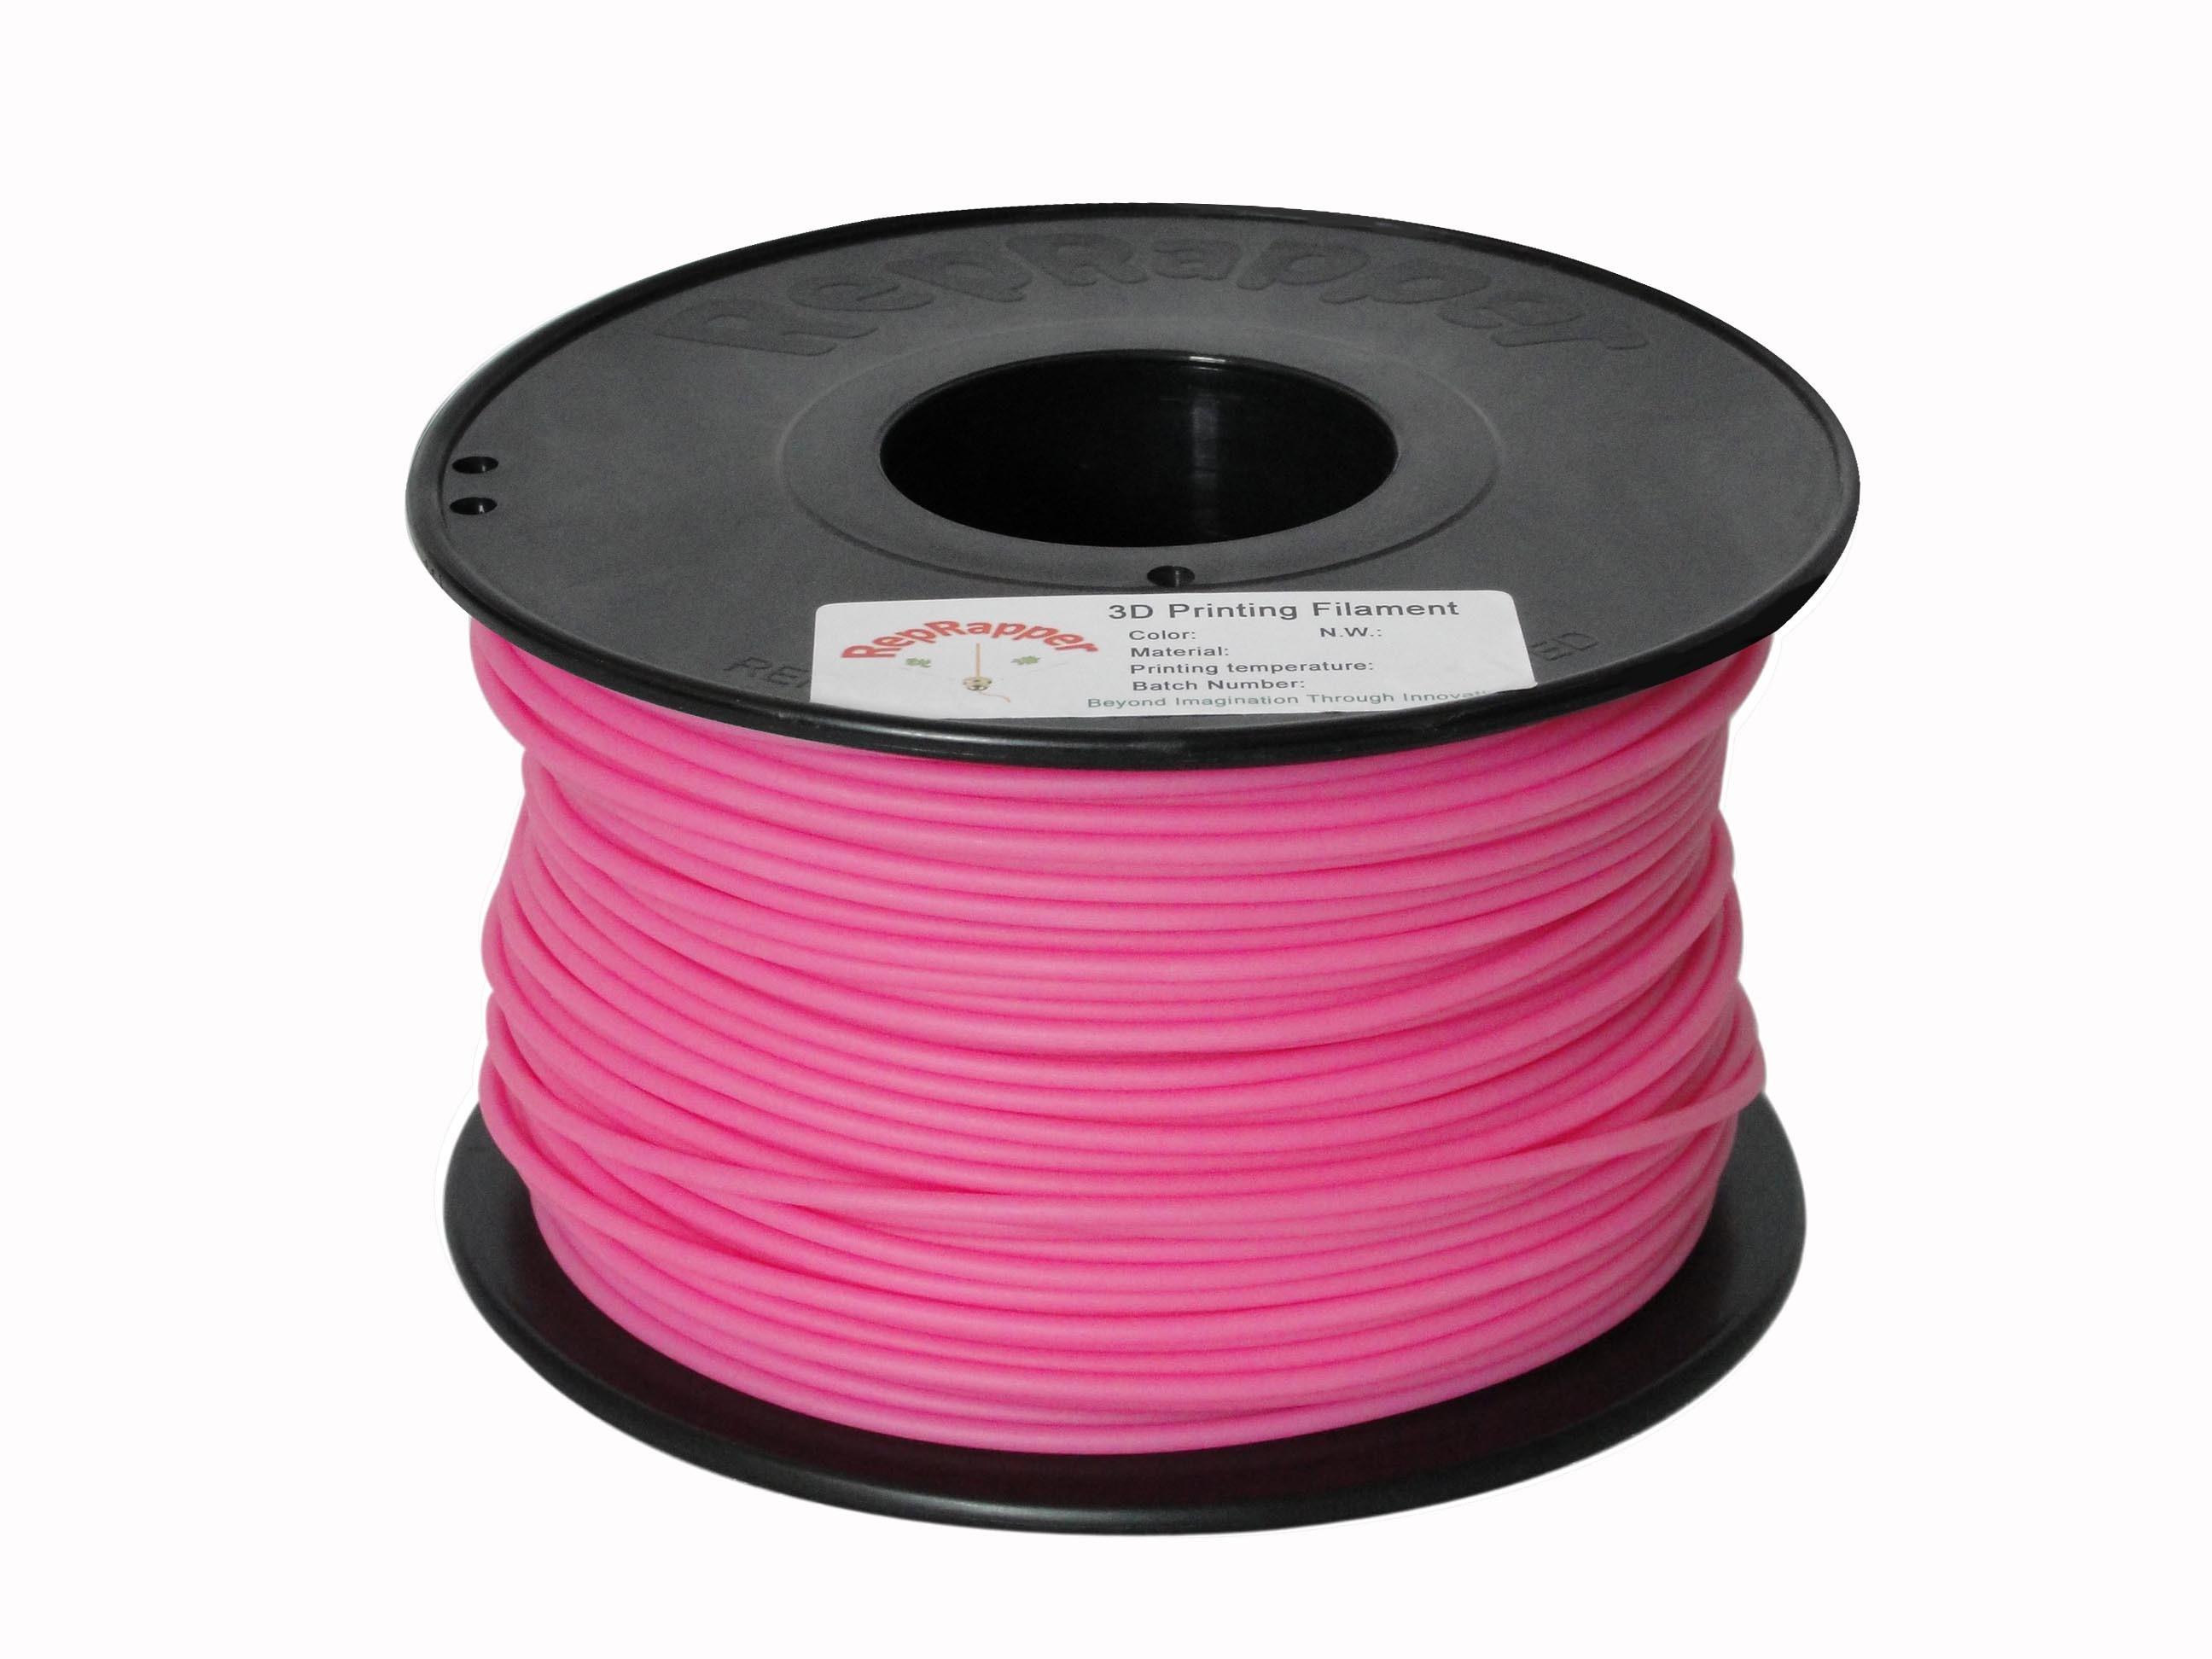 PLA 3,0 mm de filamento de impresión 3D de color rosa para la impresora 3D.